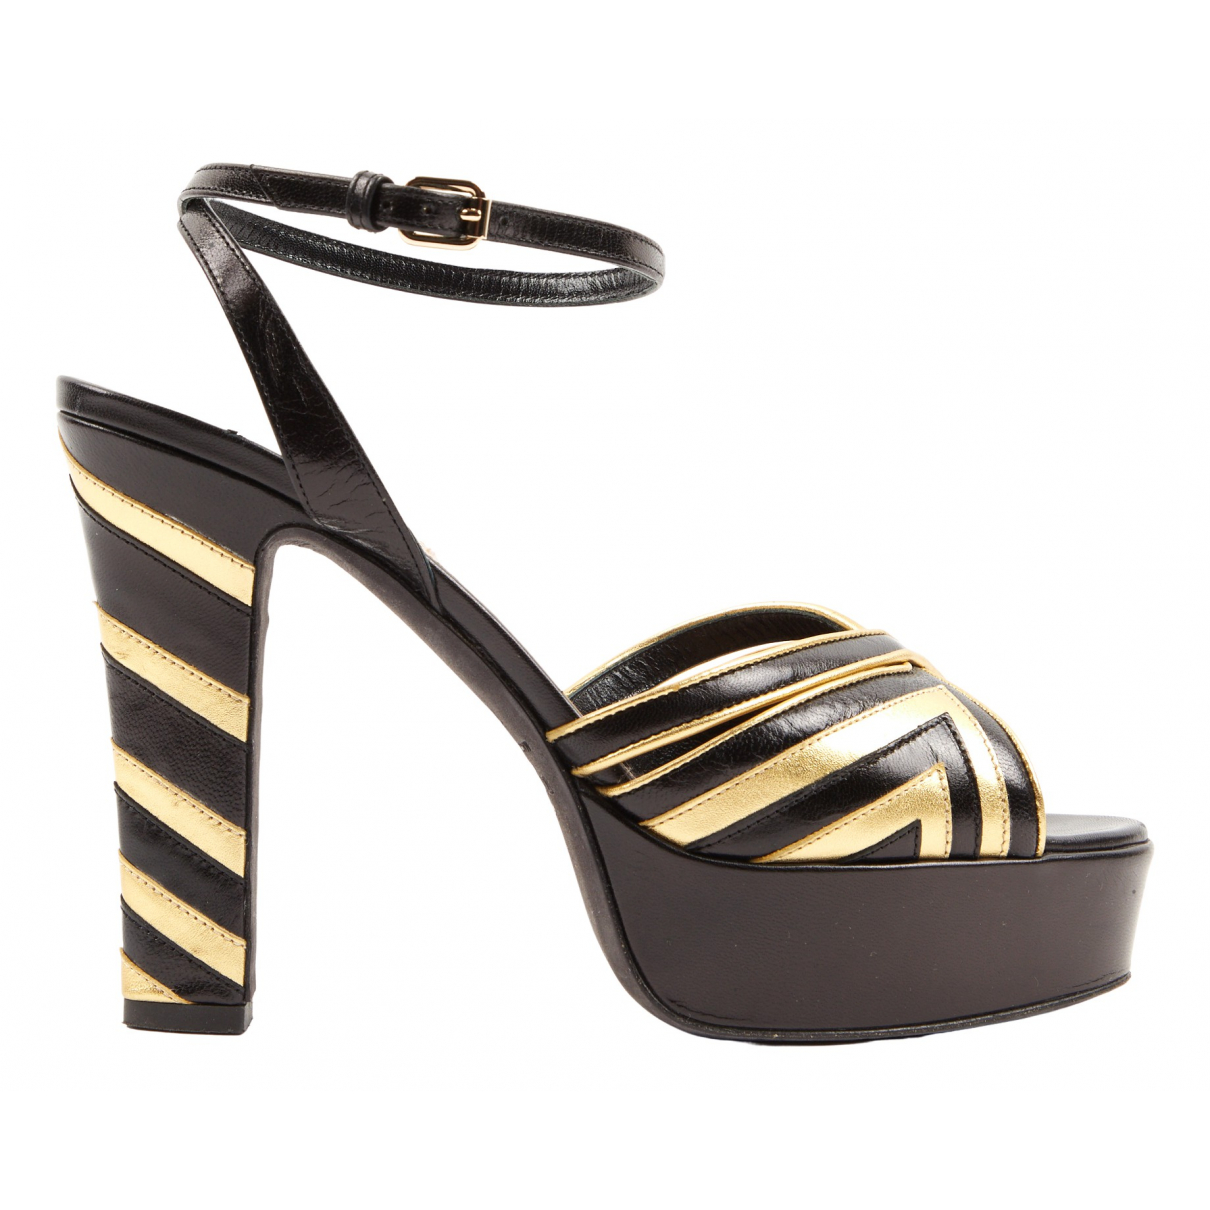 Valentino Garavani N Black Leather Sandals for Women 37.5 IT